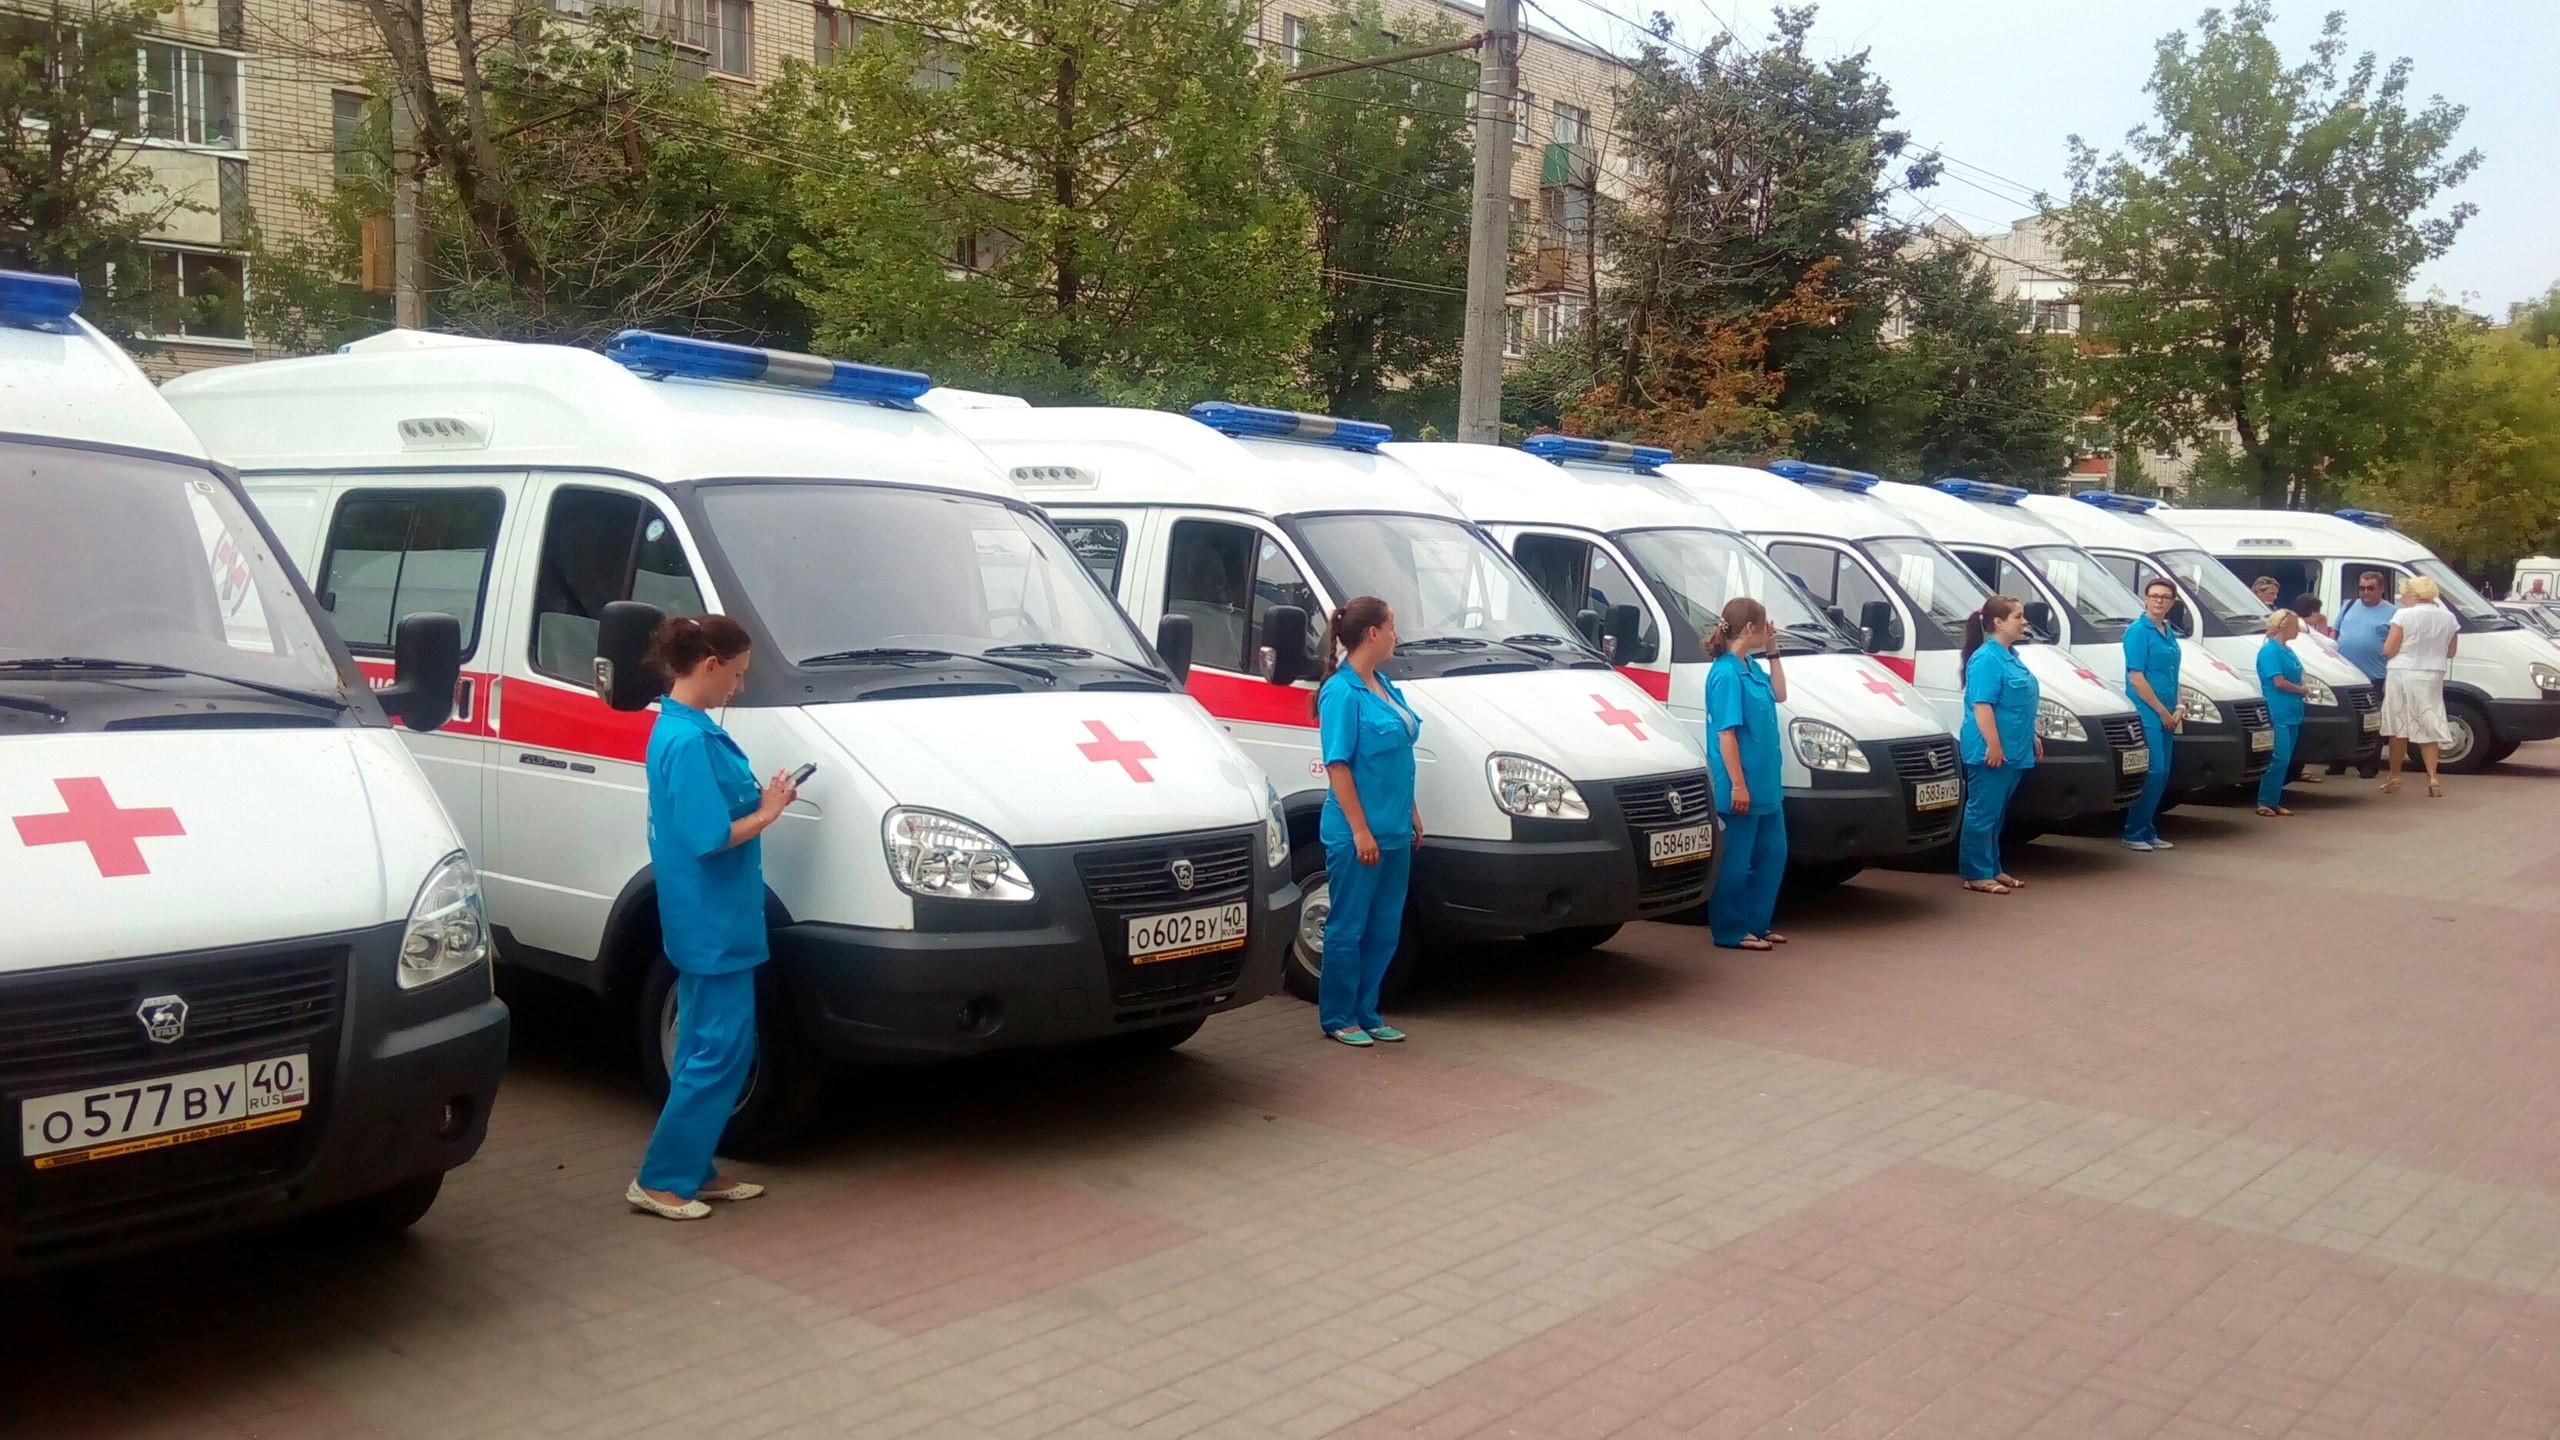 Минздрав Пермского края потратит 589 млн руб. нааренду авто скорой помощи